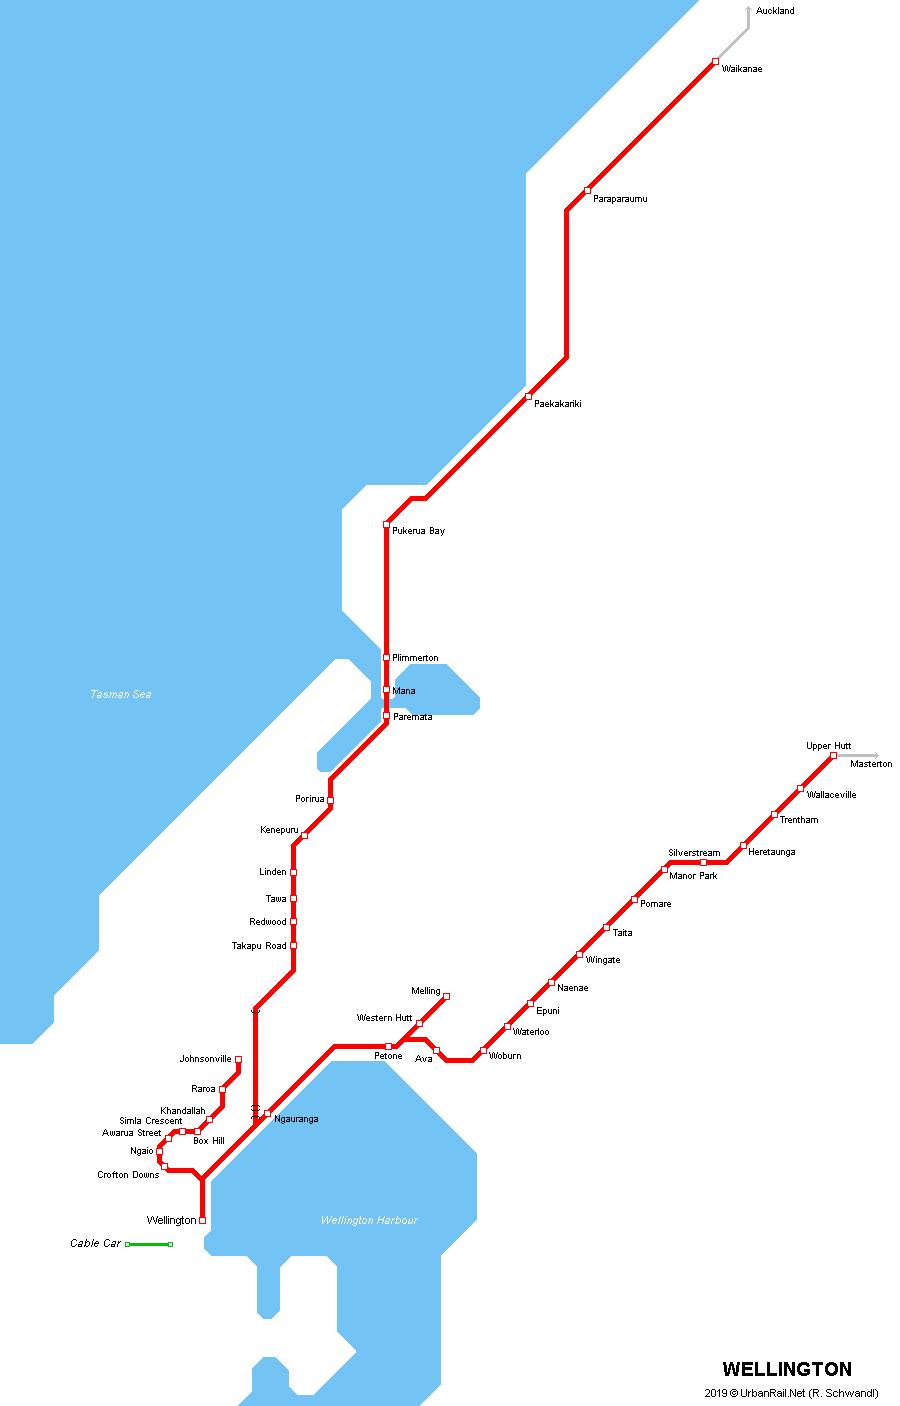 UrbanRailNet Oceania New Zealand Wellington Tranz Metro